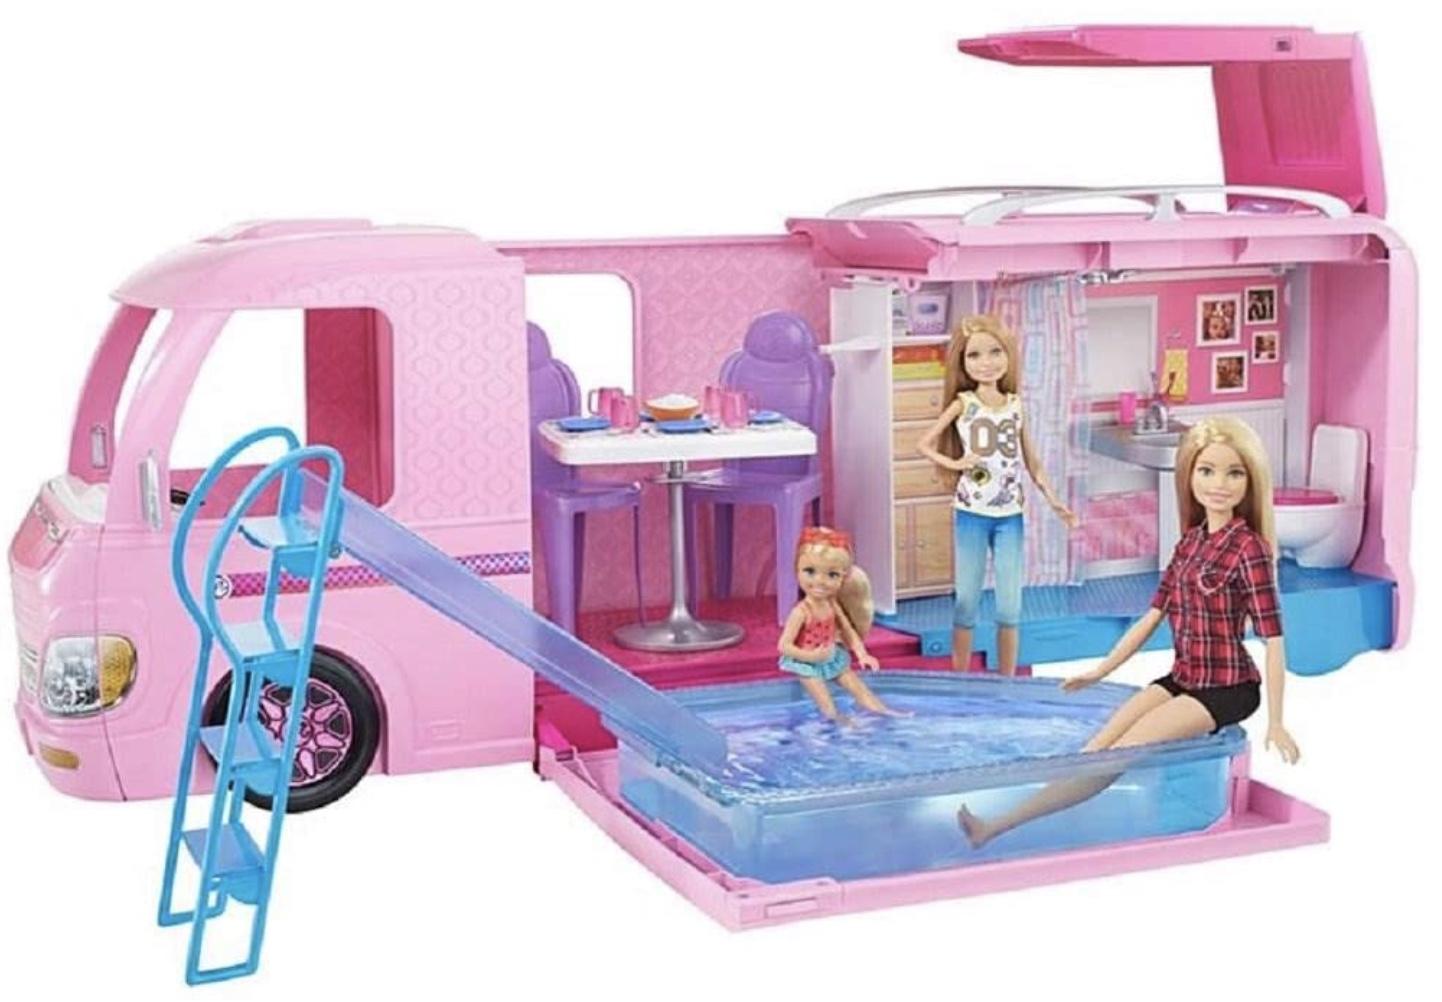 Code promo Amazon : Camping-Car Barbie Transformable à 59,99€